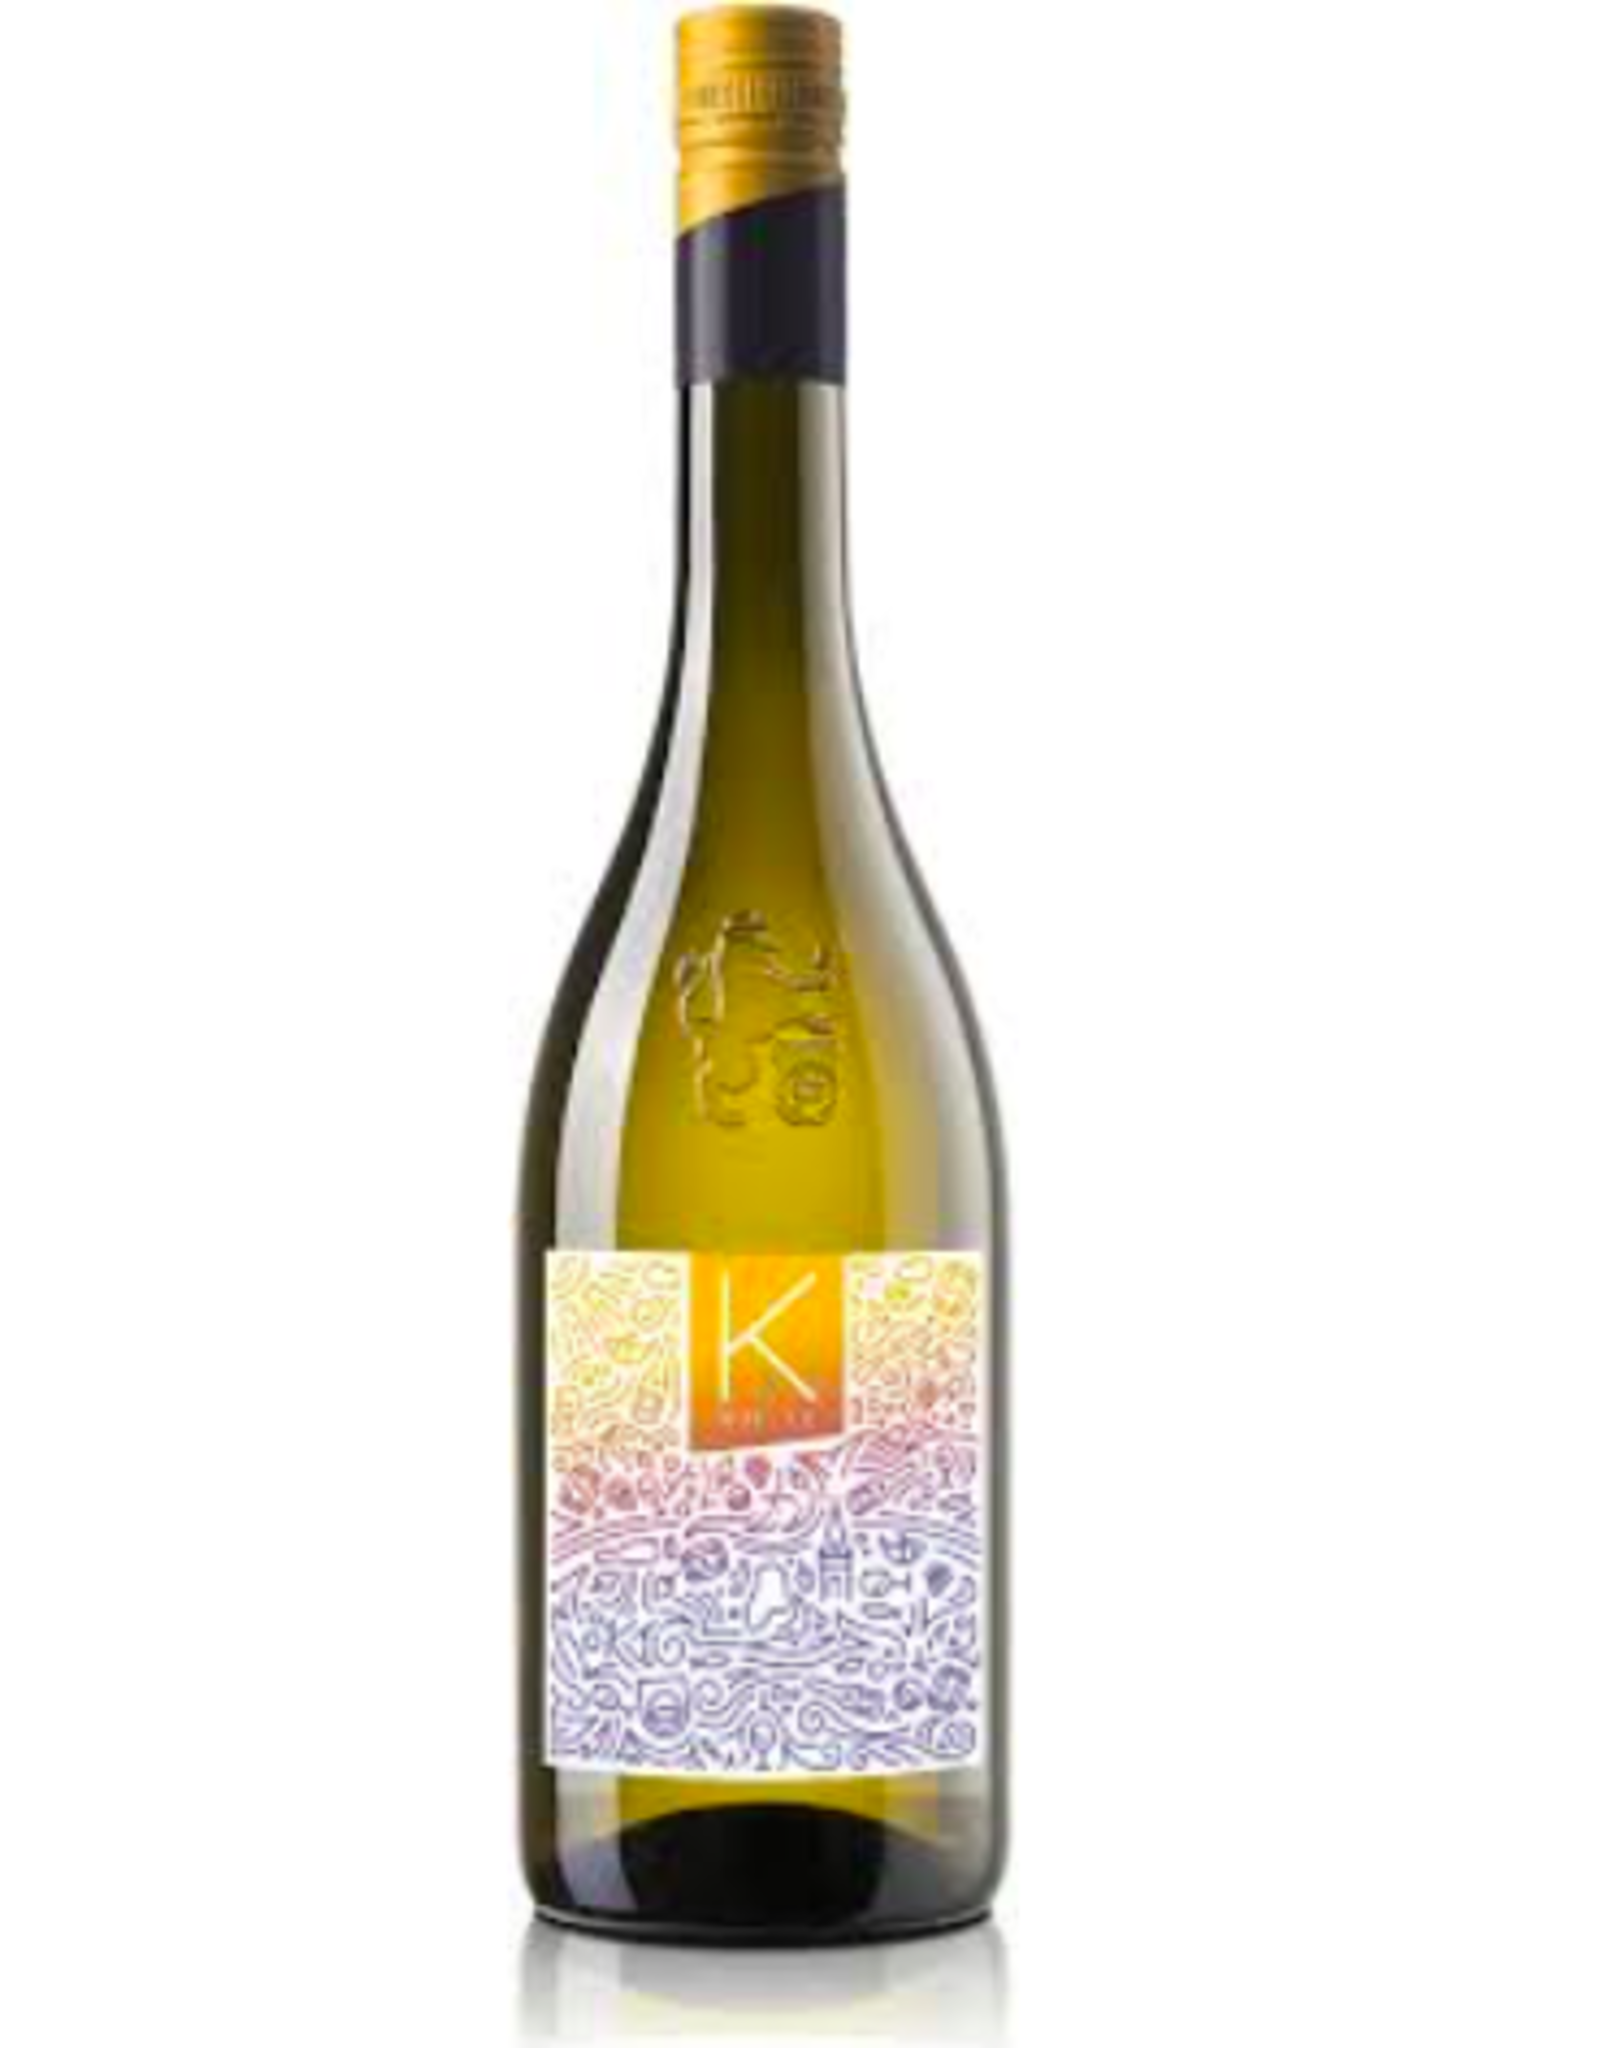 Kellerei Kaltern K Bianco Blend Dolomiti2019